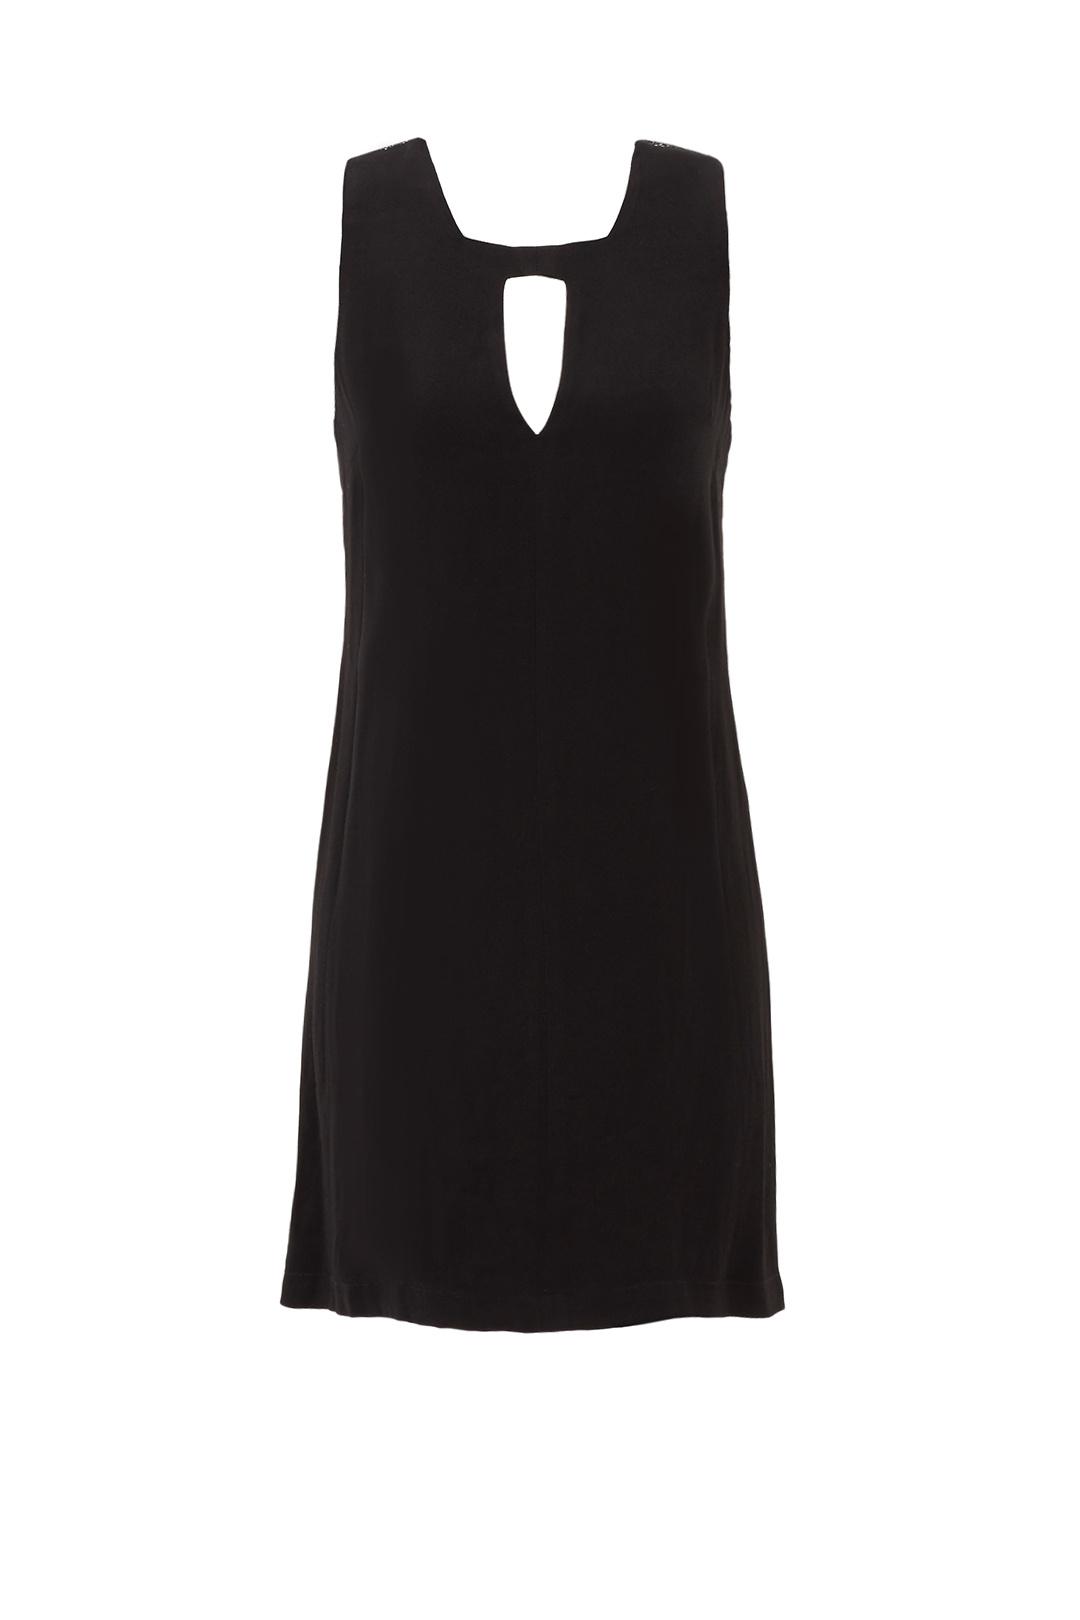 2017clothing maufacturers OEM black open women dress